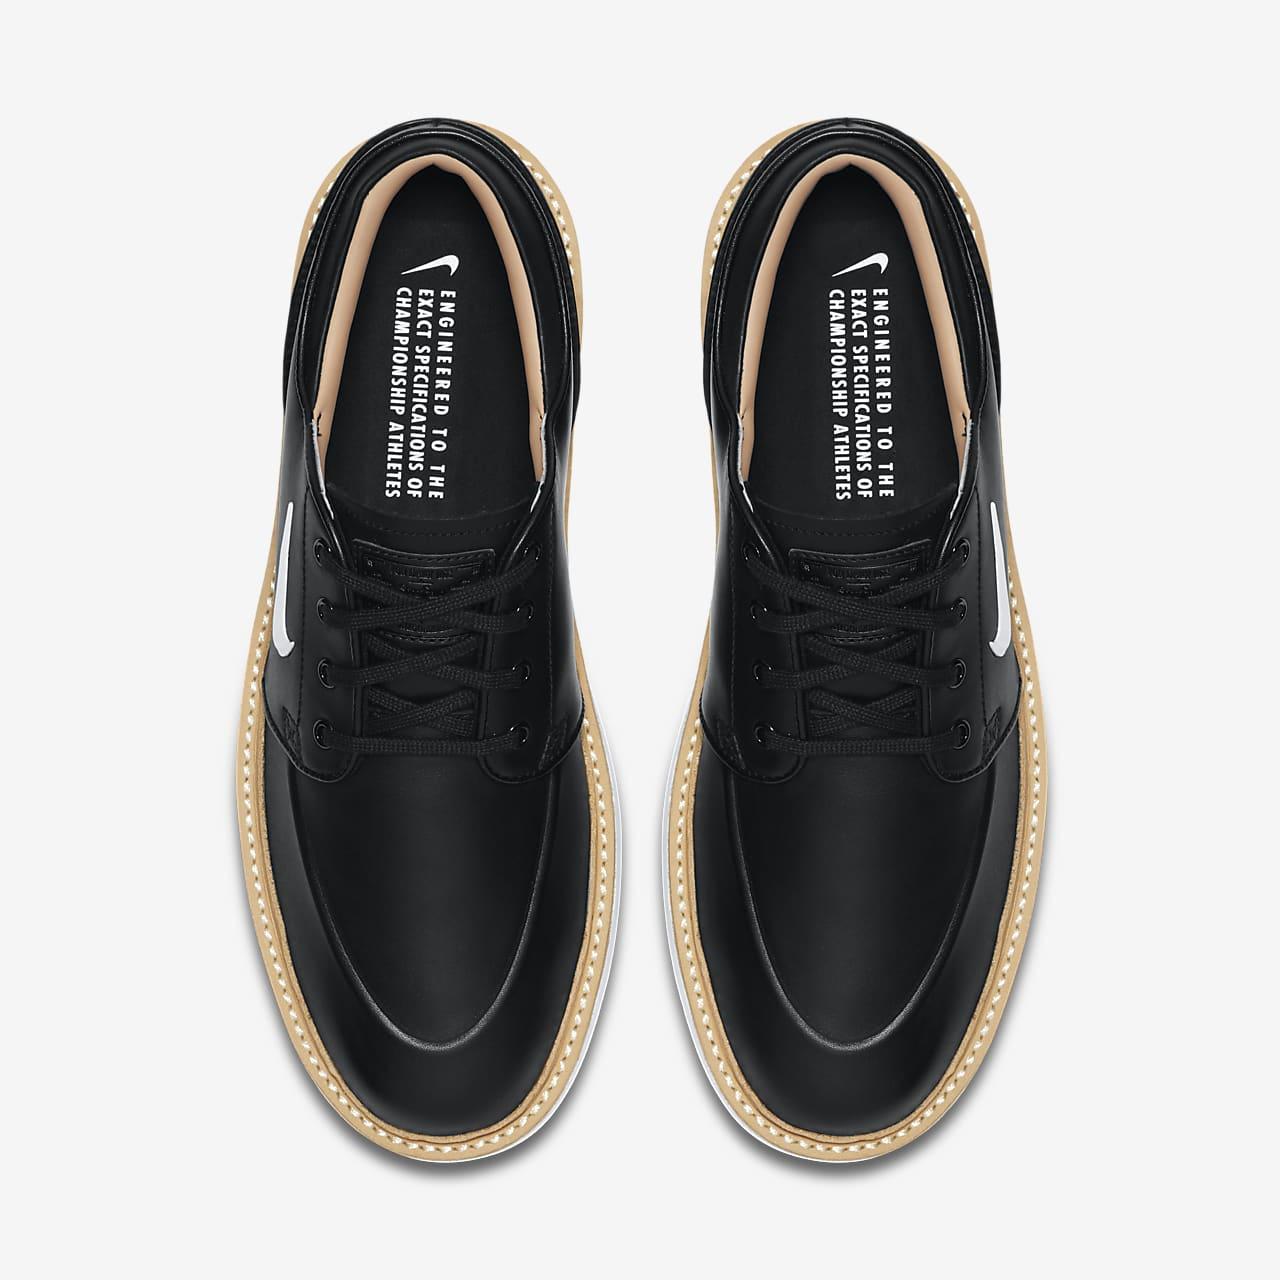 nike dress shoes mens